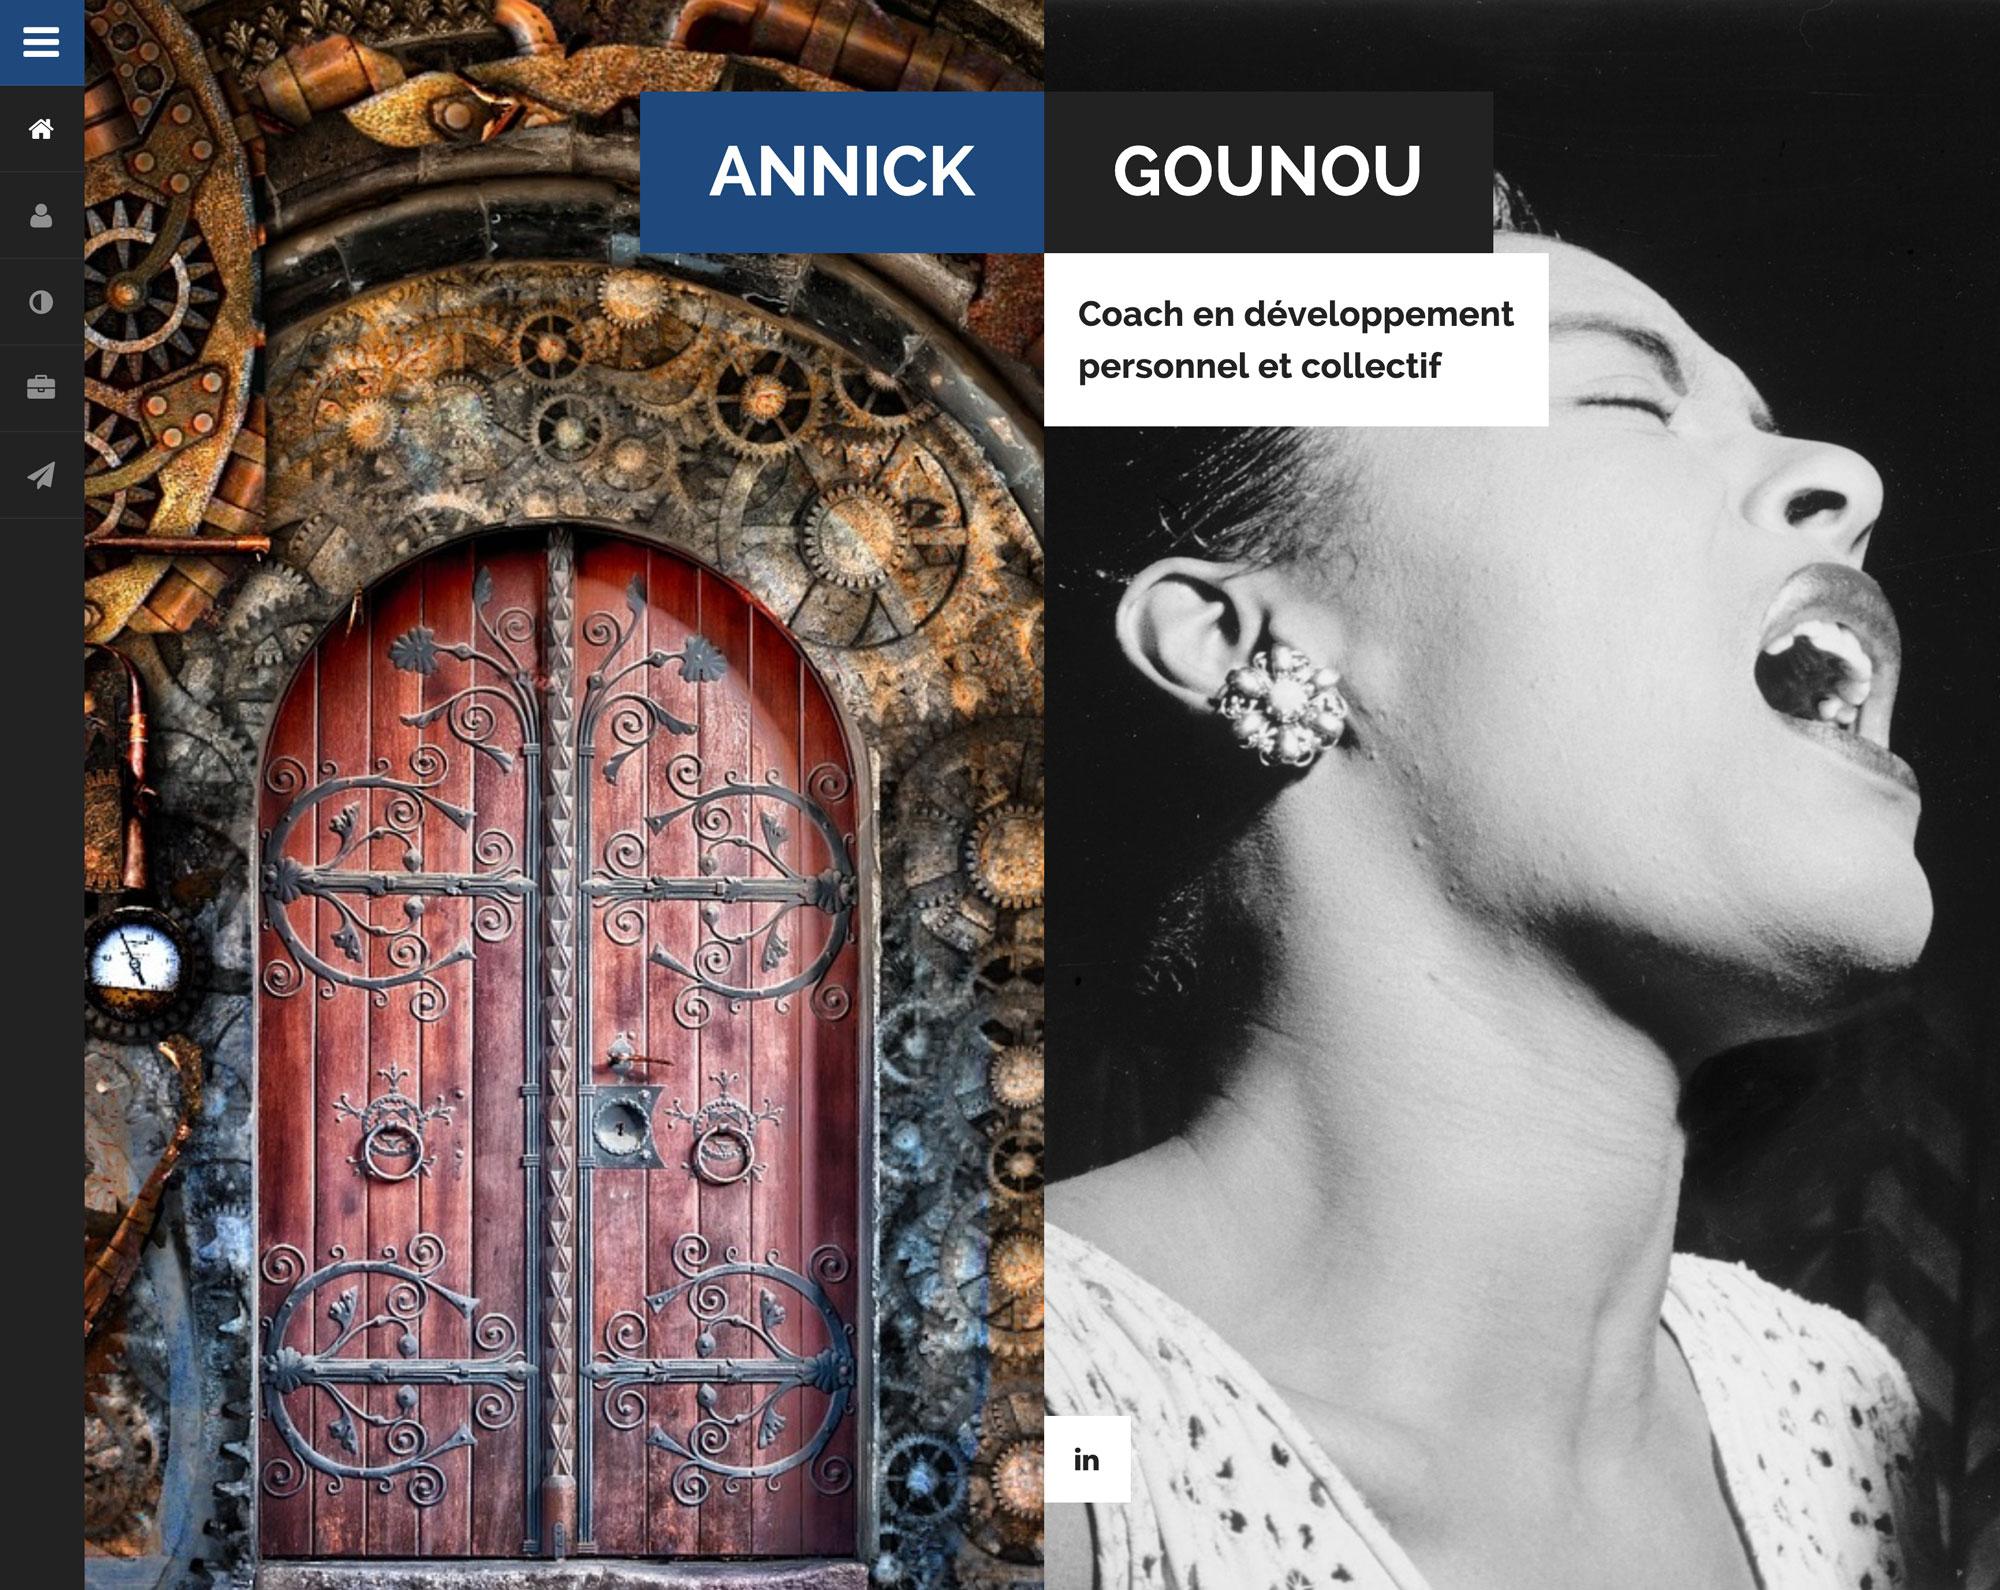 Annick Gounou